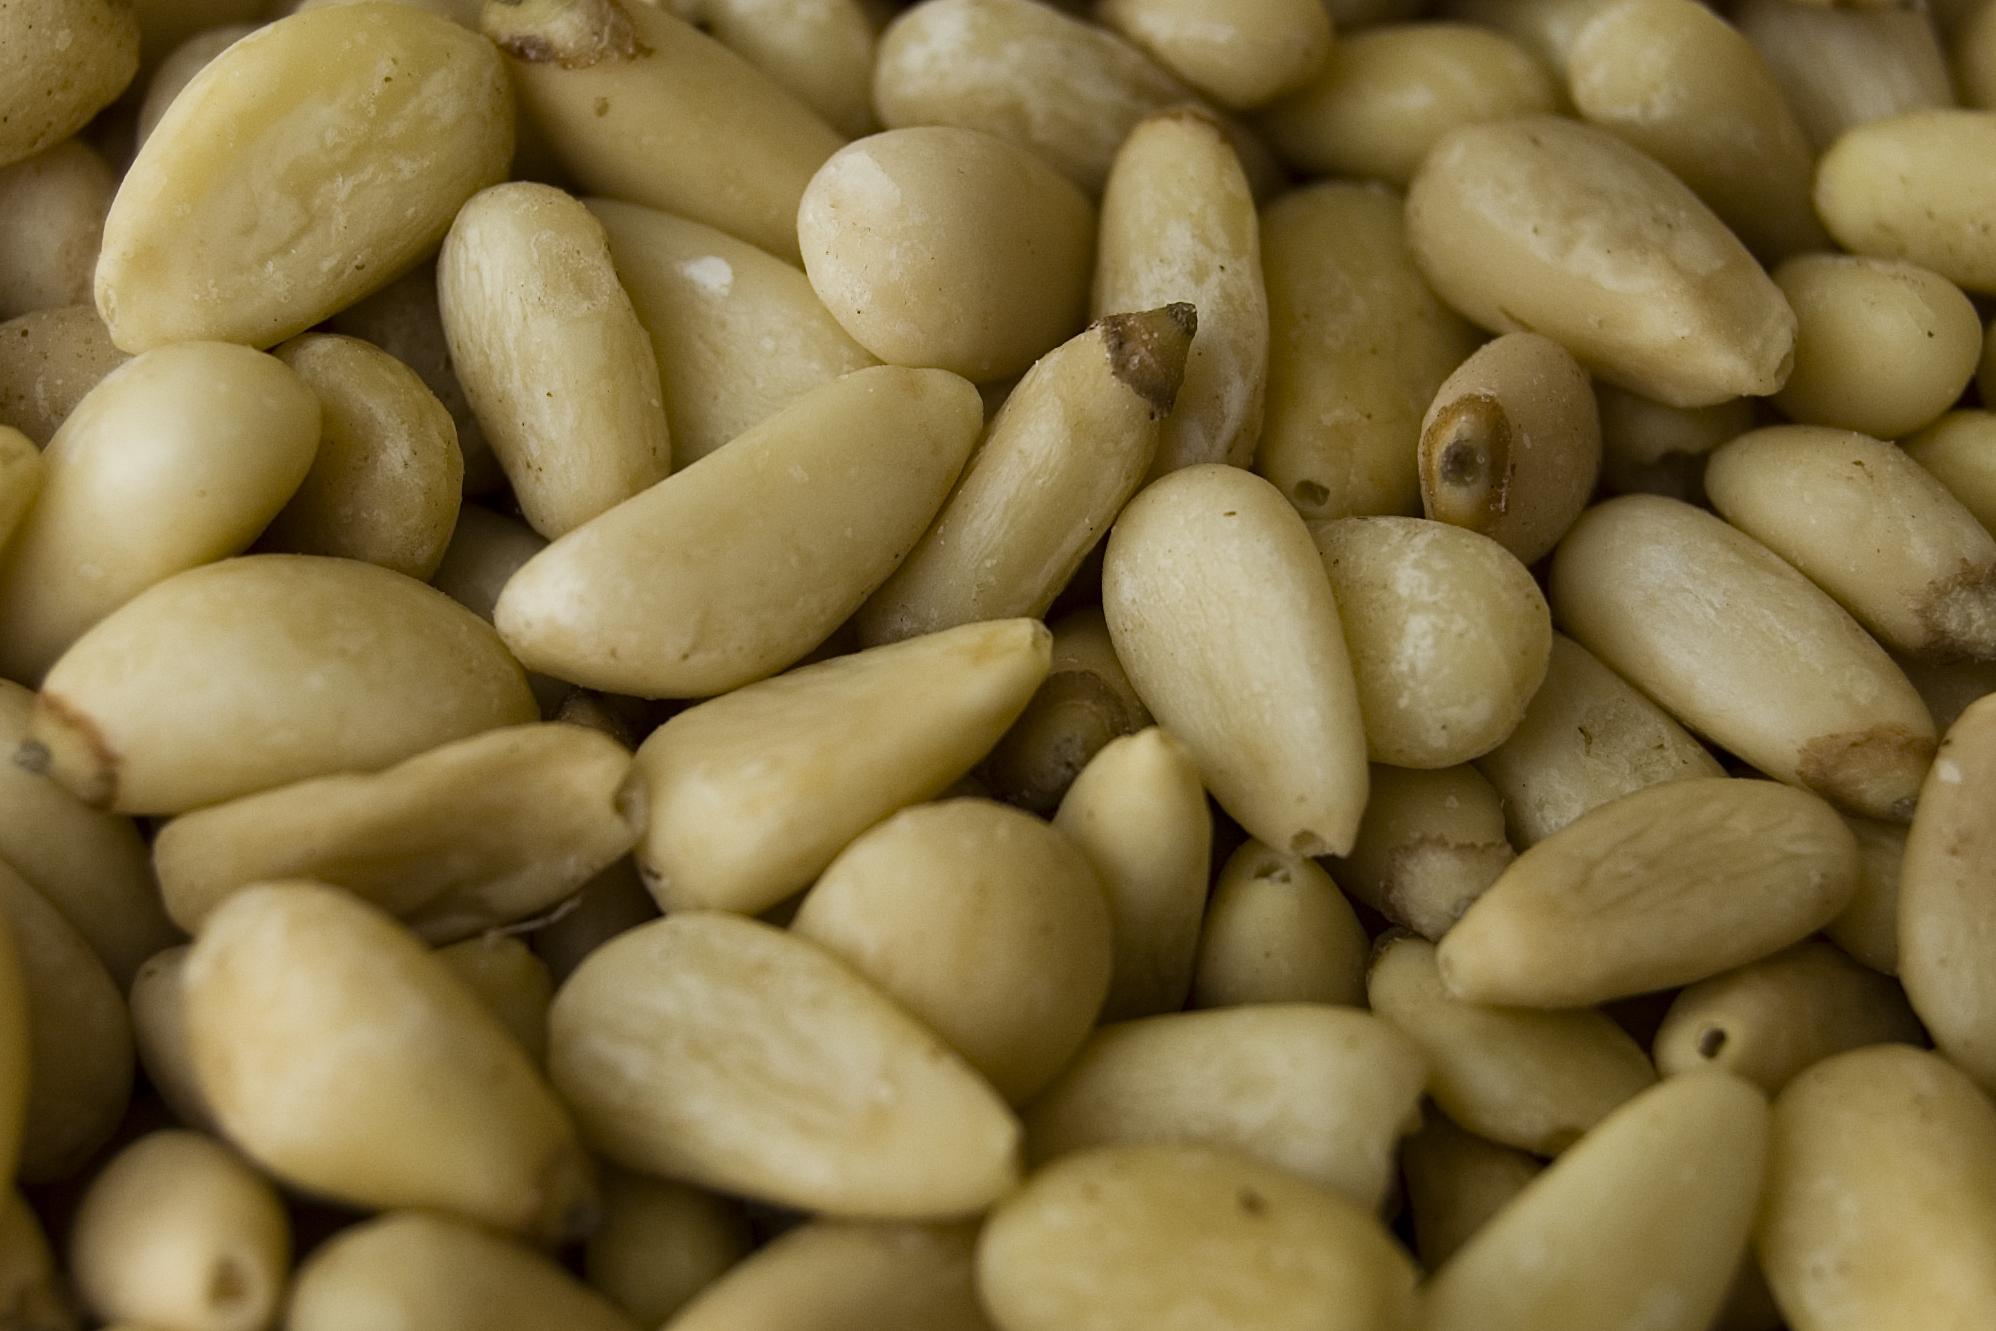 Where do you get pine nuts